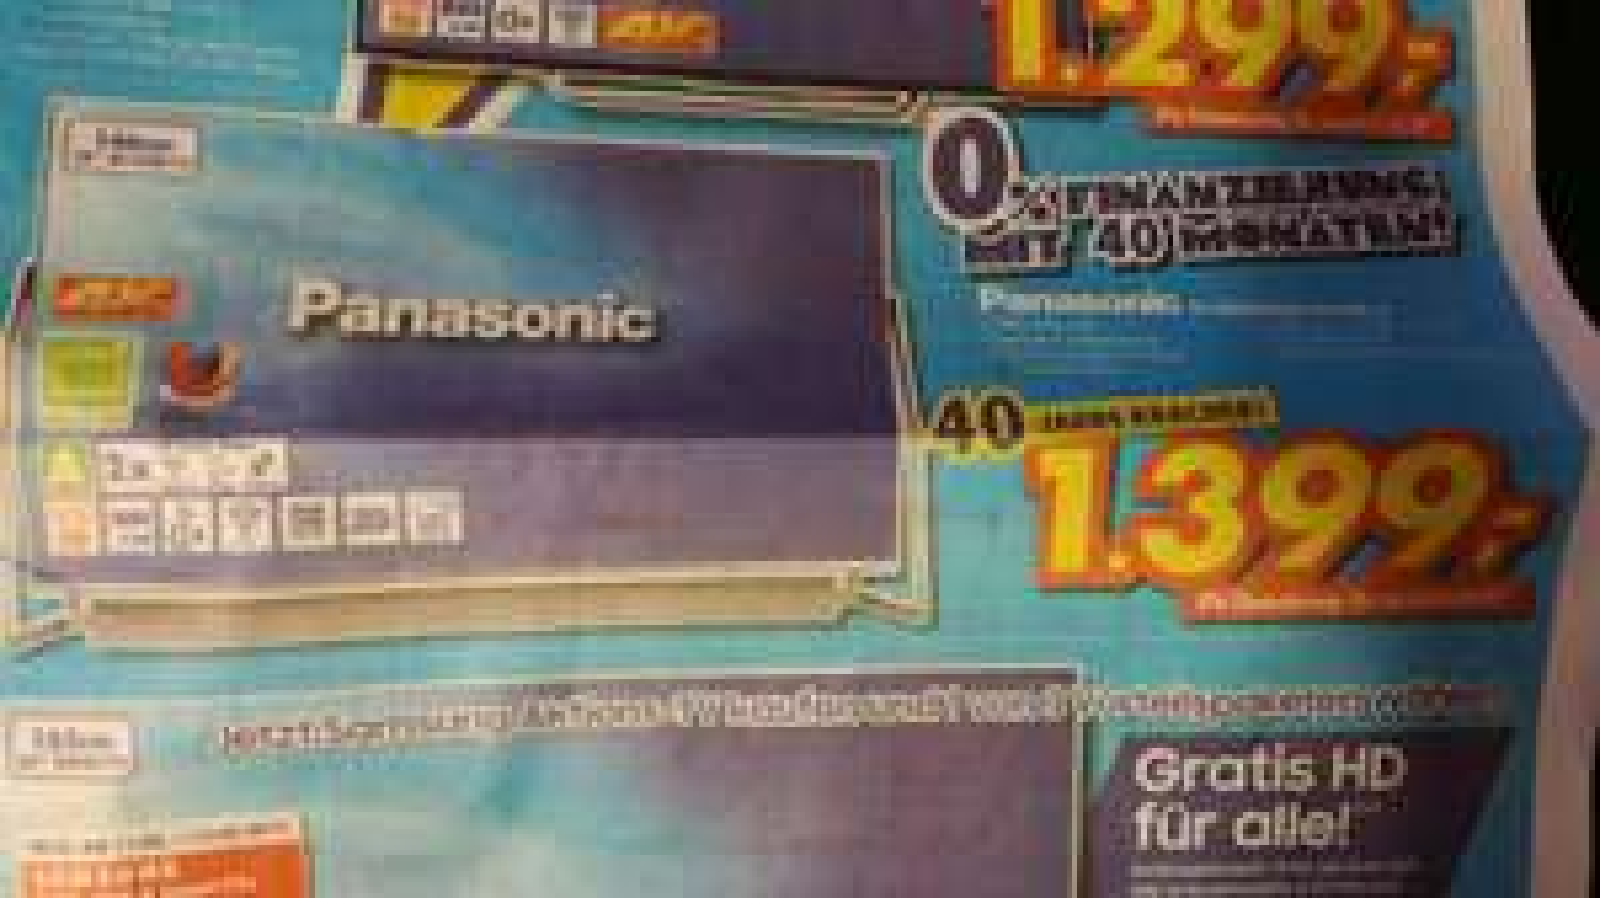 Panasonic 58DXW804 für 1399 Euronics